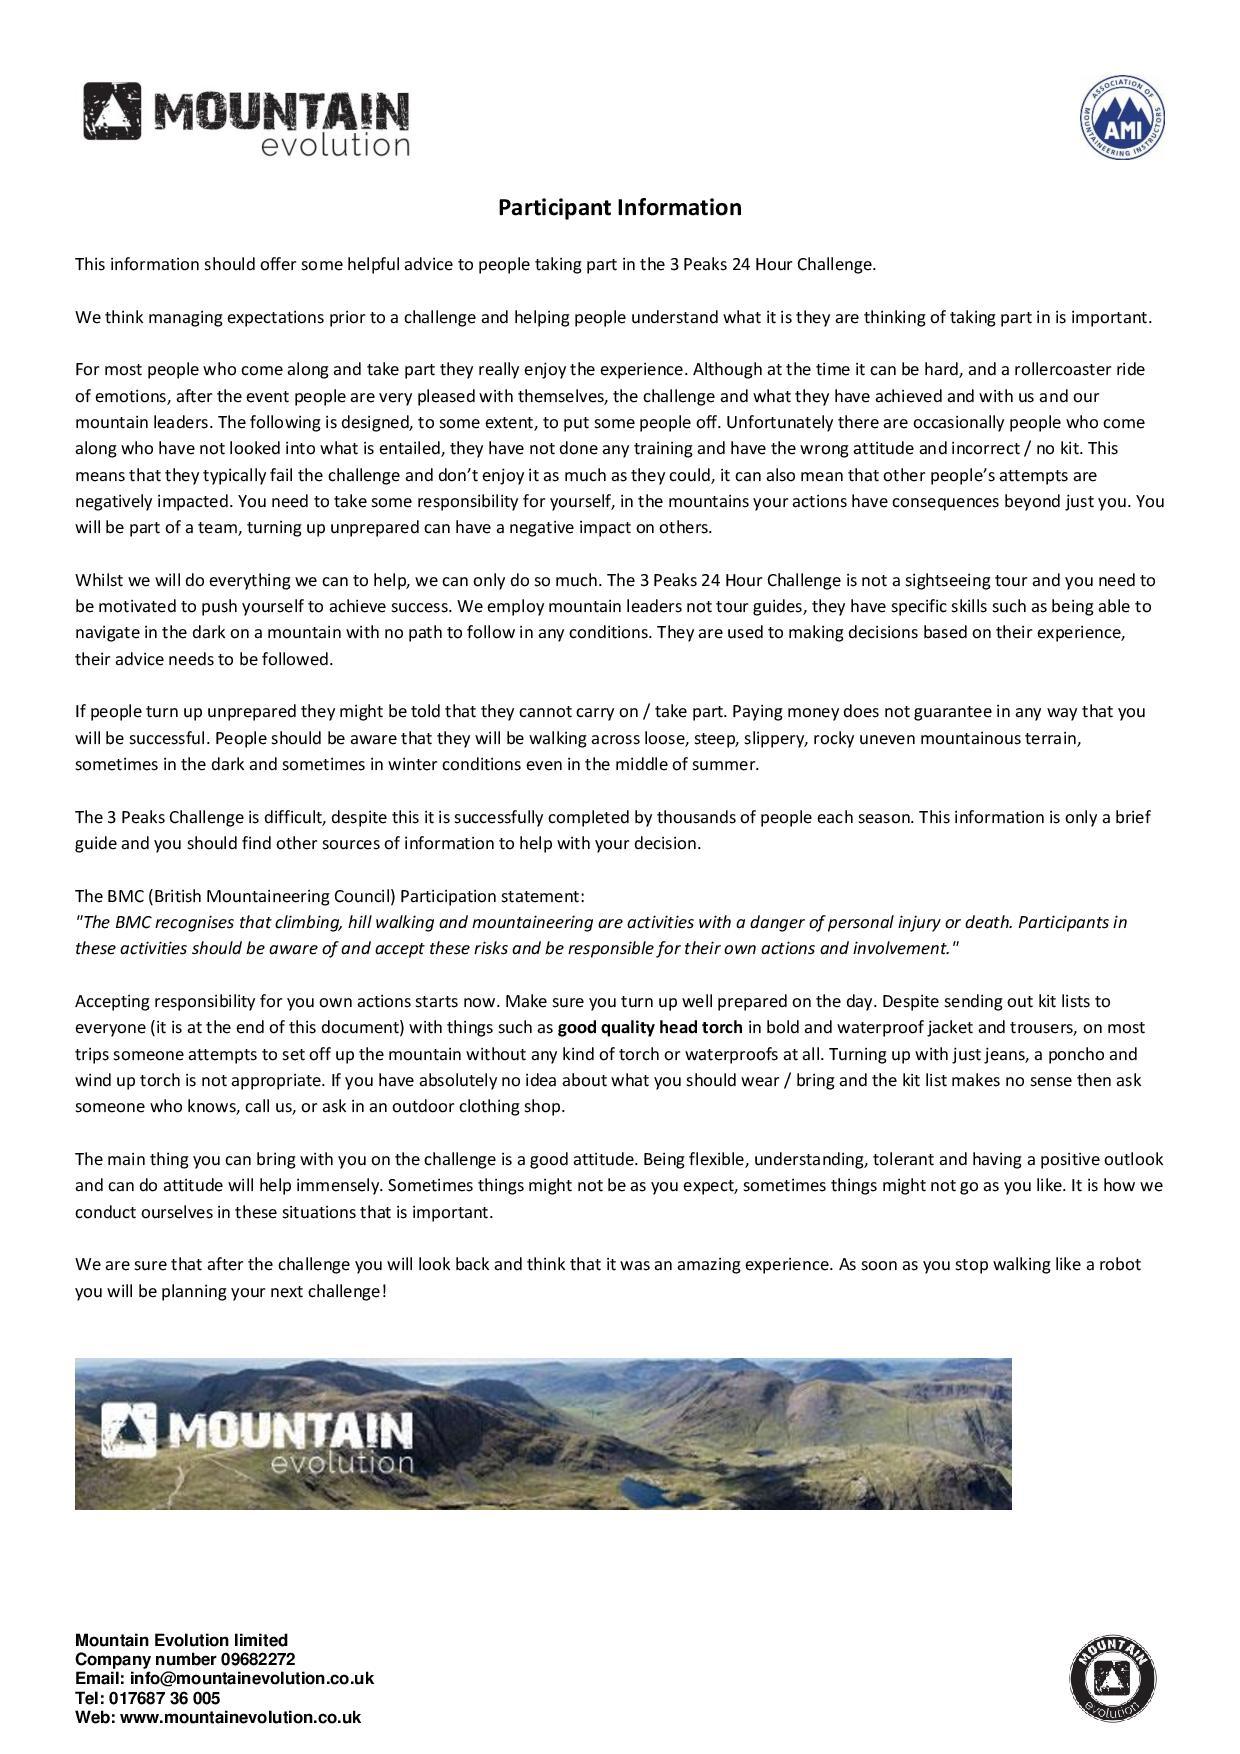 Information. 3 Peaks. Mountain Evolution. (1)-page-002.jpg